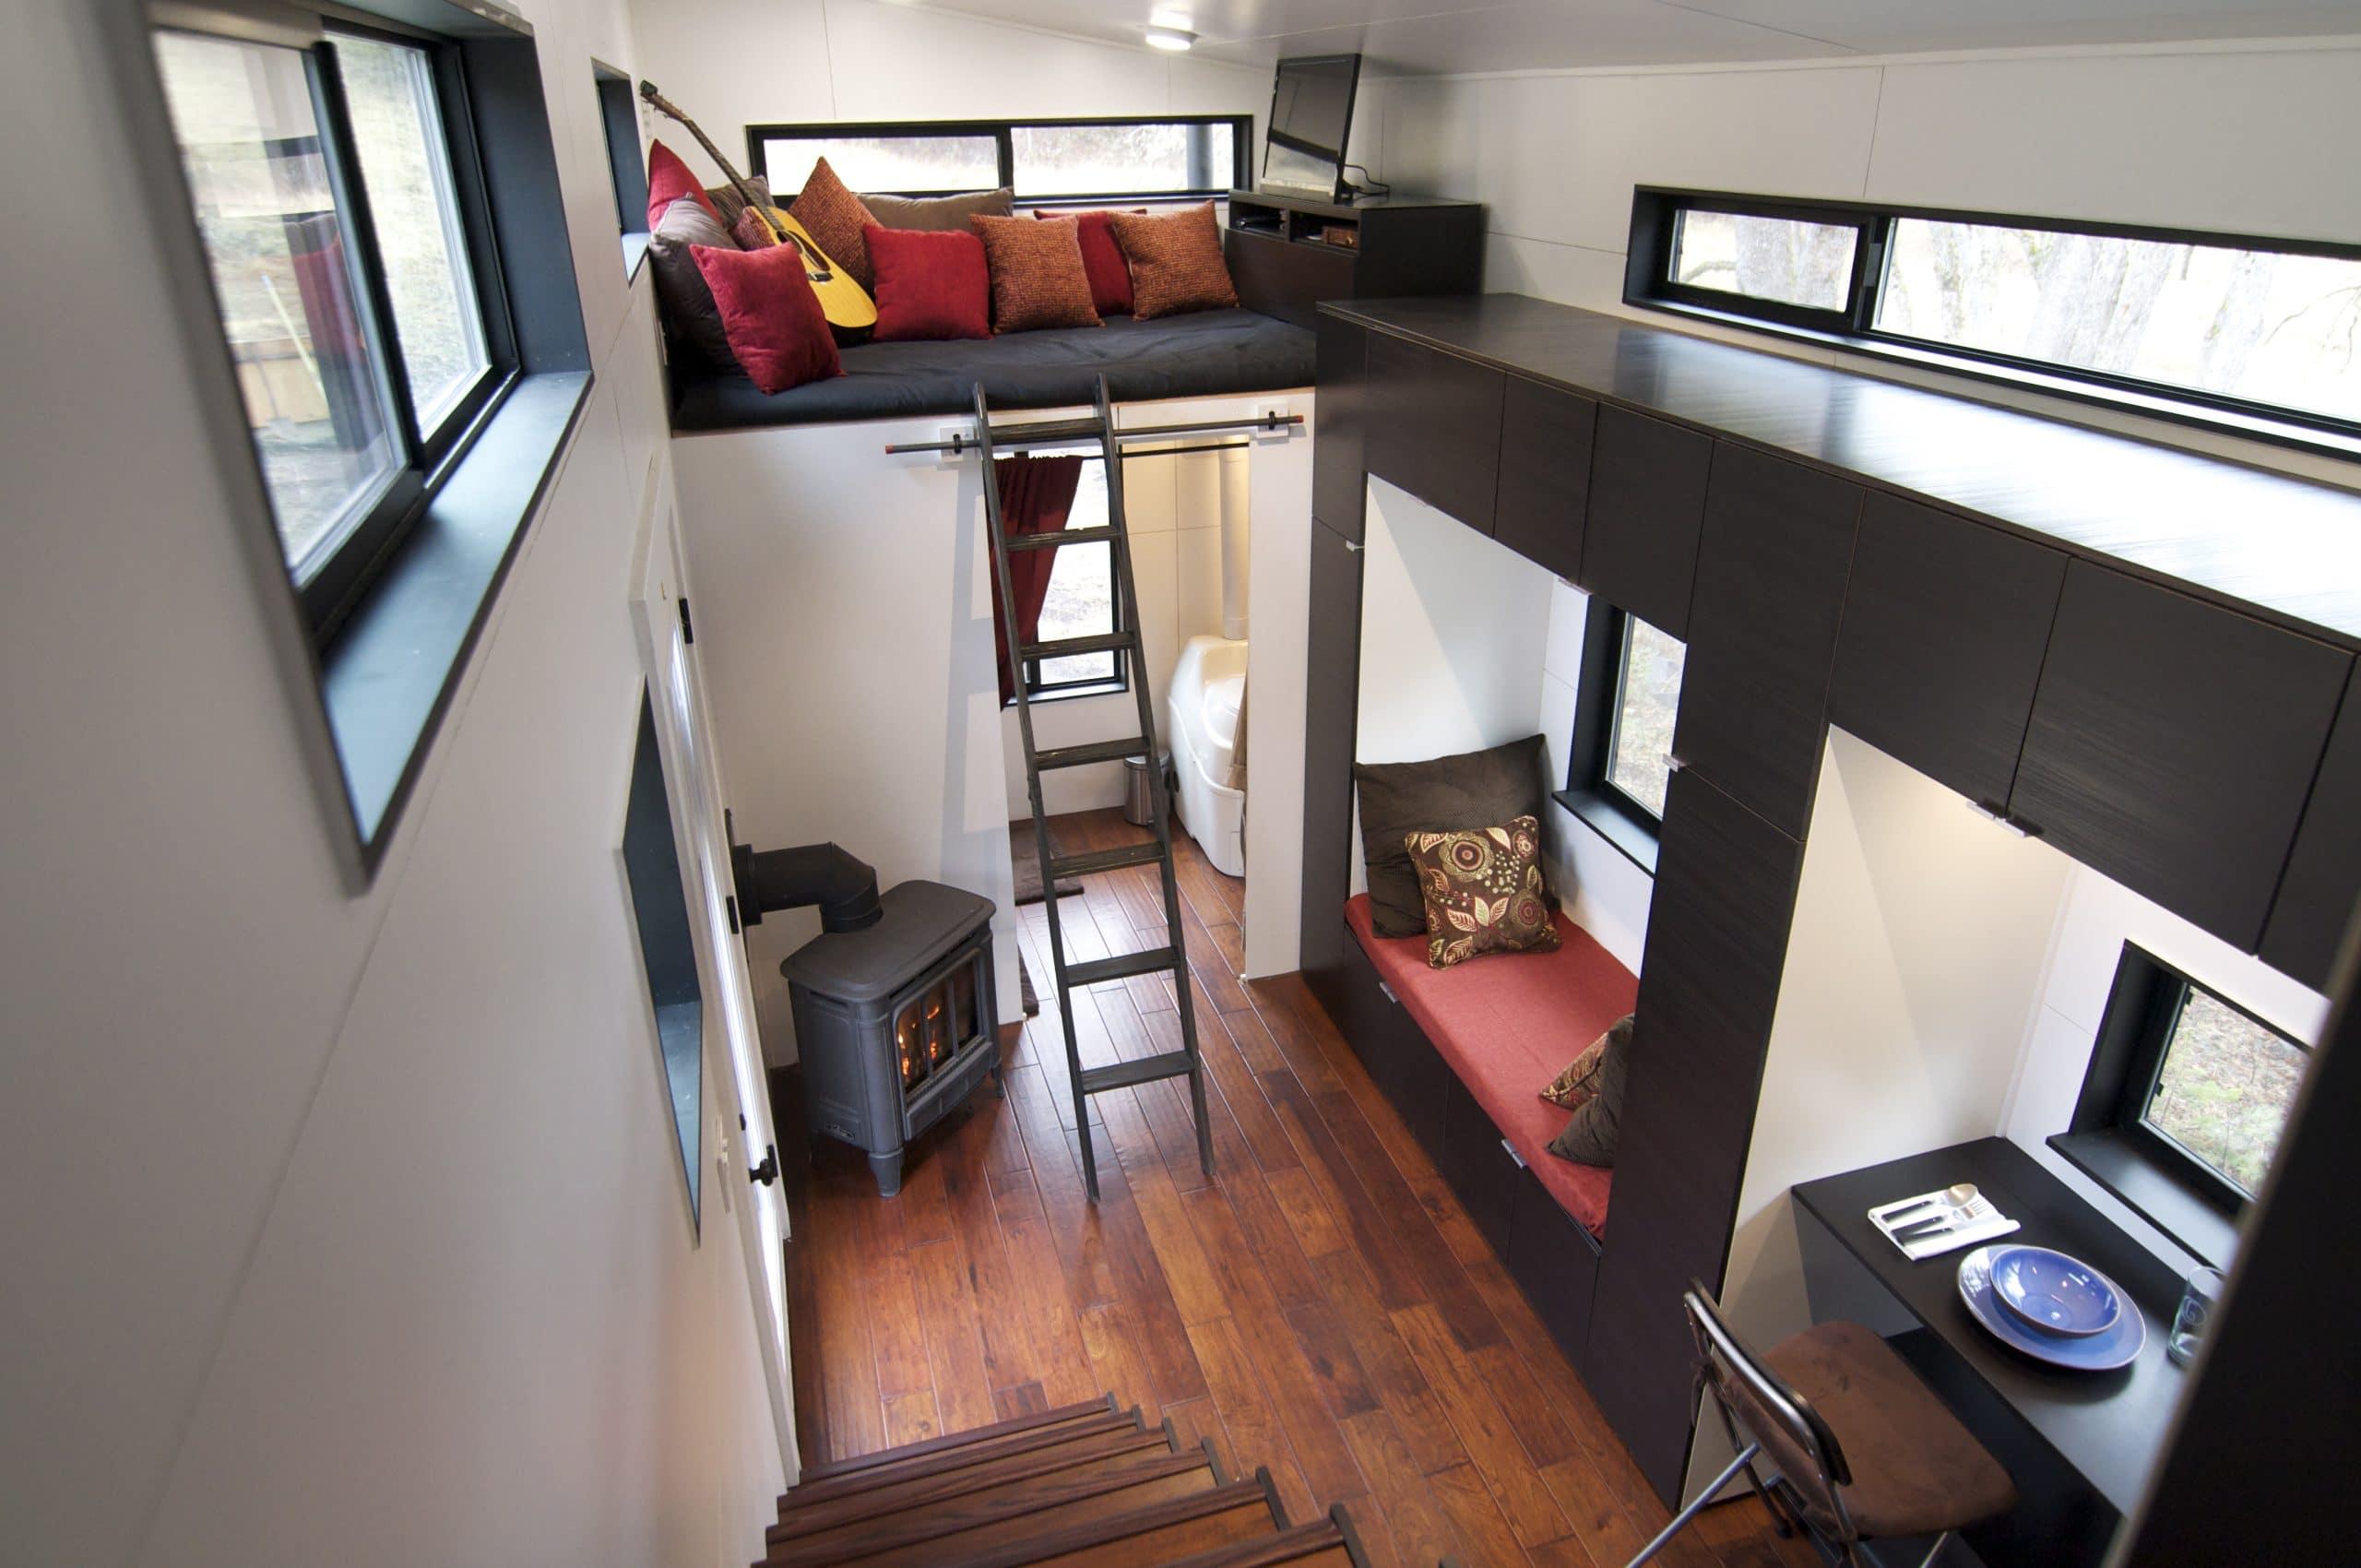 Dise o de casa muy peque a optimizando espacios construye hogar - Paginas de diseno de interiores ...